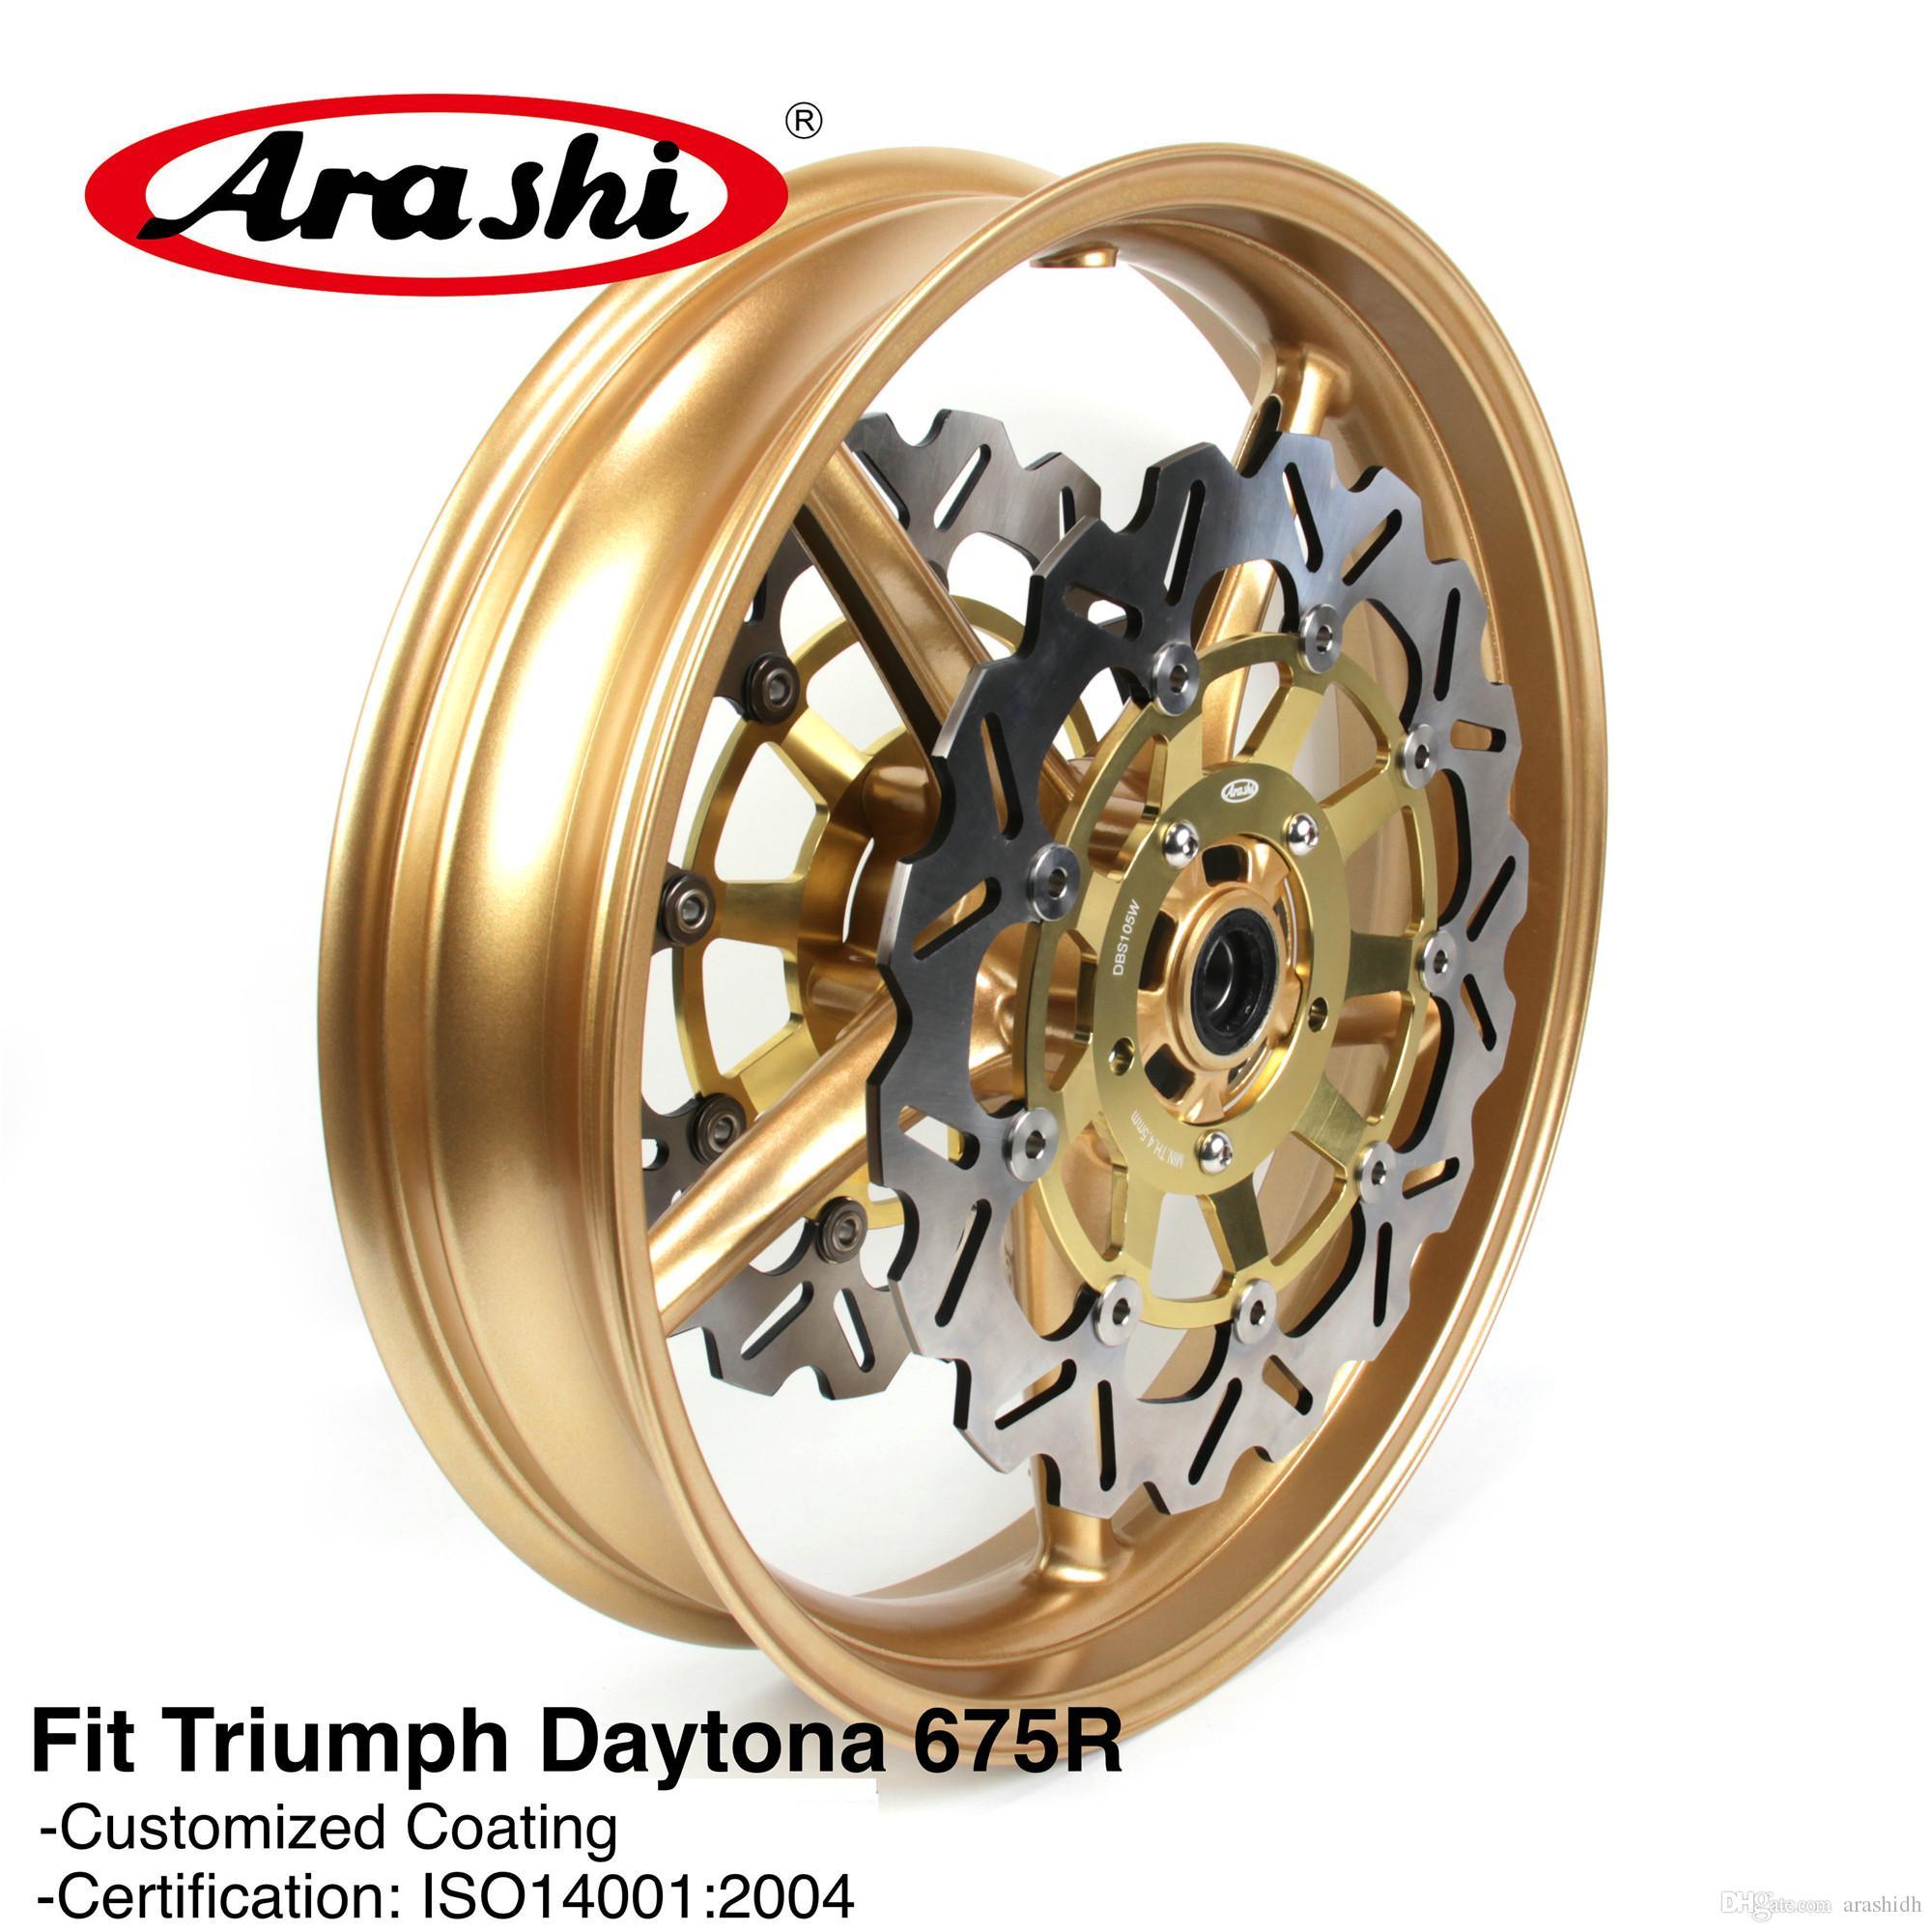 Arashi For Triumph Daytona 675 R 2011 2012 Front Wheel Rim Brake